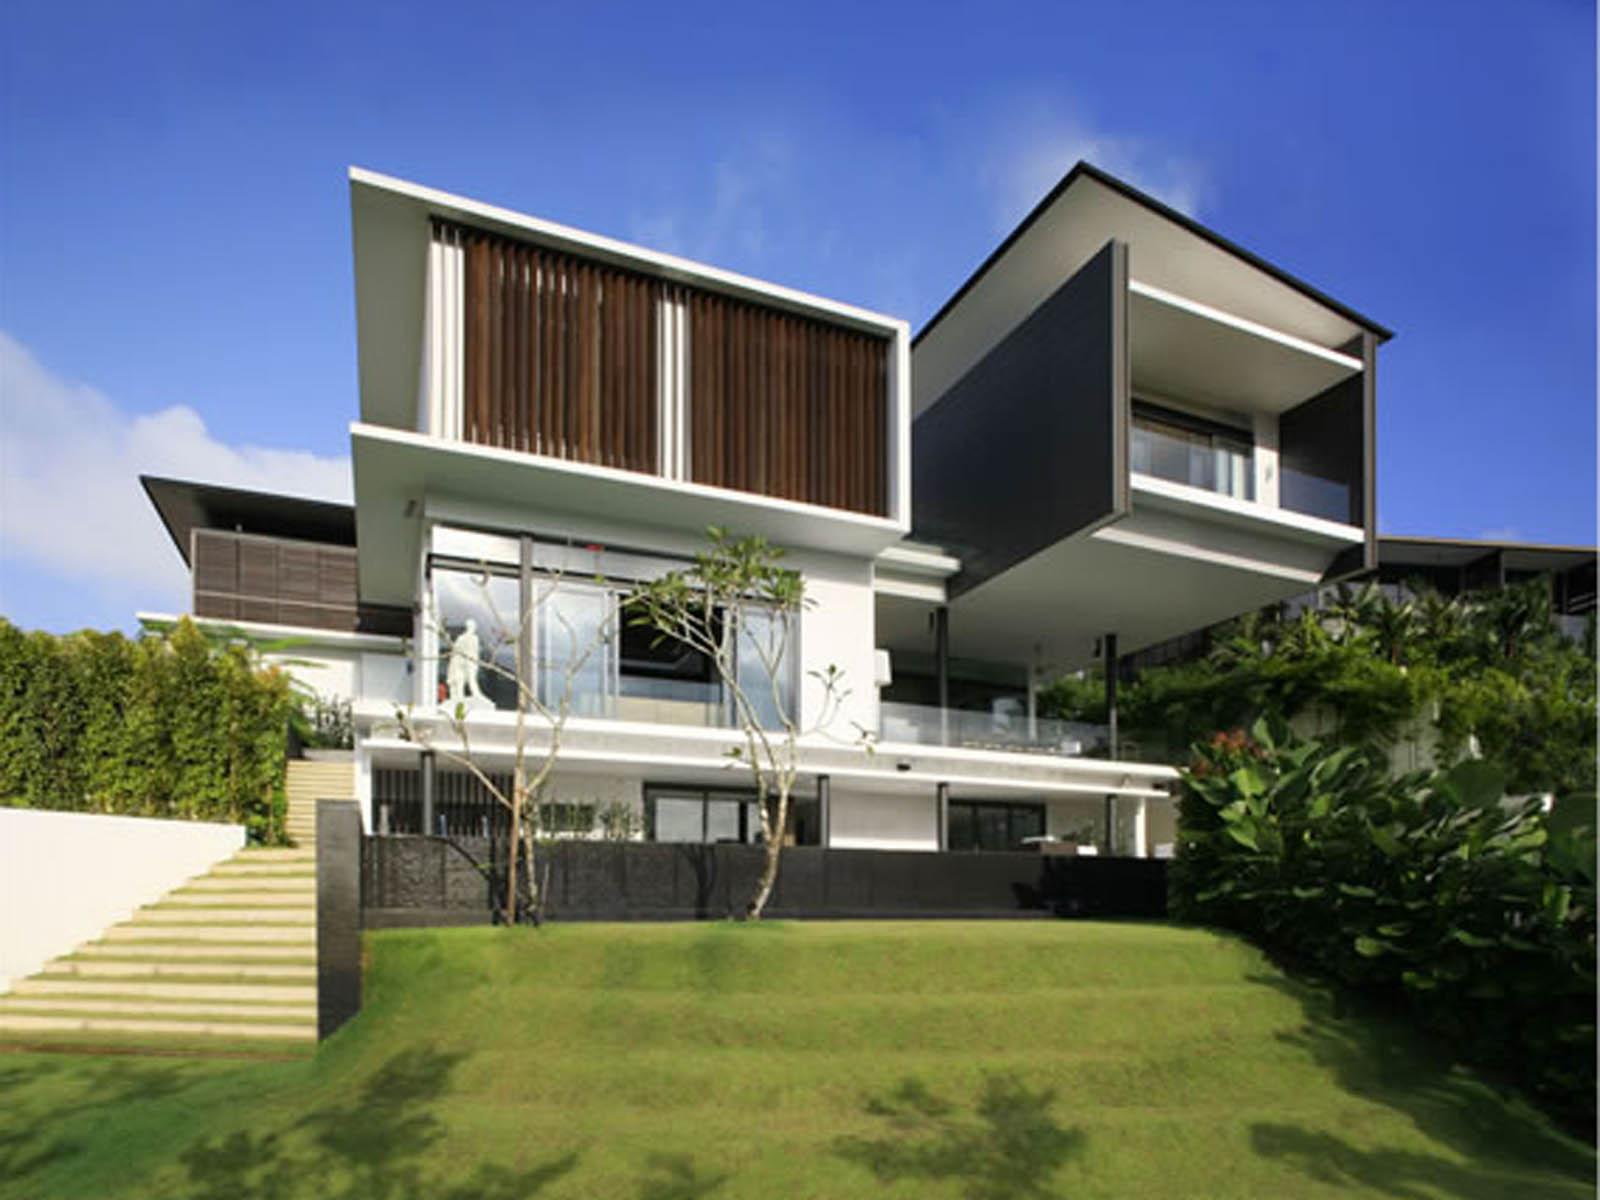 Minecraft Concrete House Design 1600x1200 Download Hd Wallpaper Wallpapertip